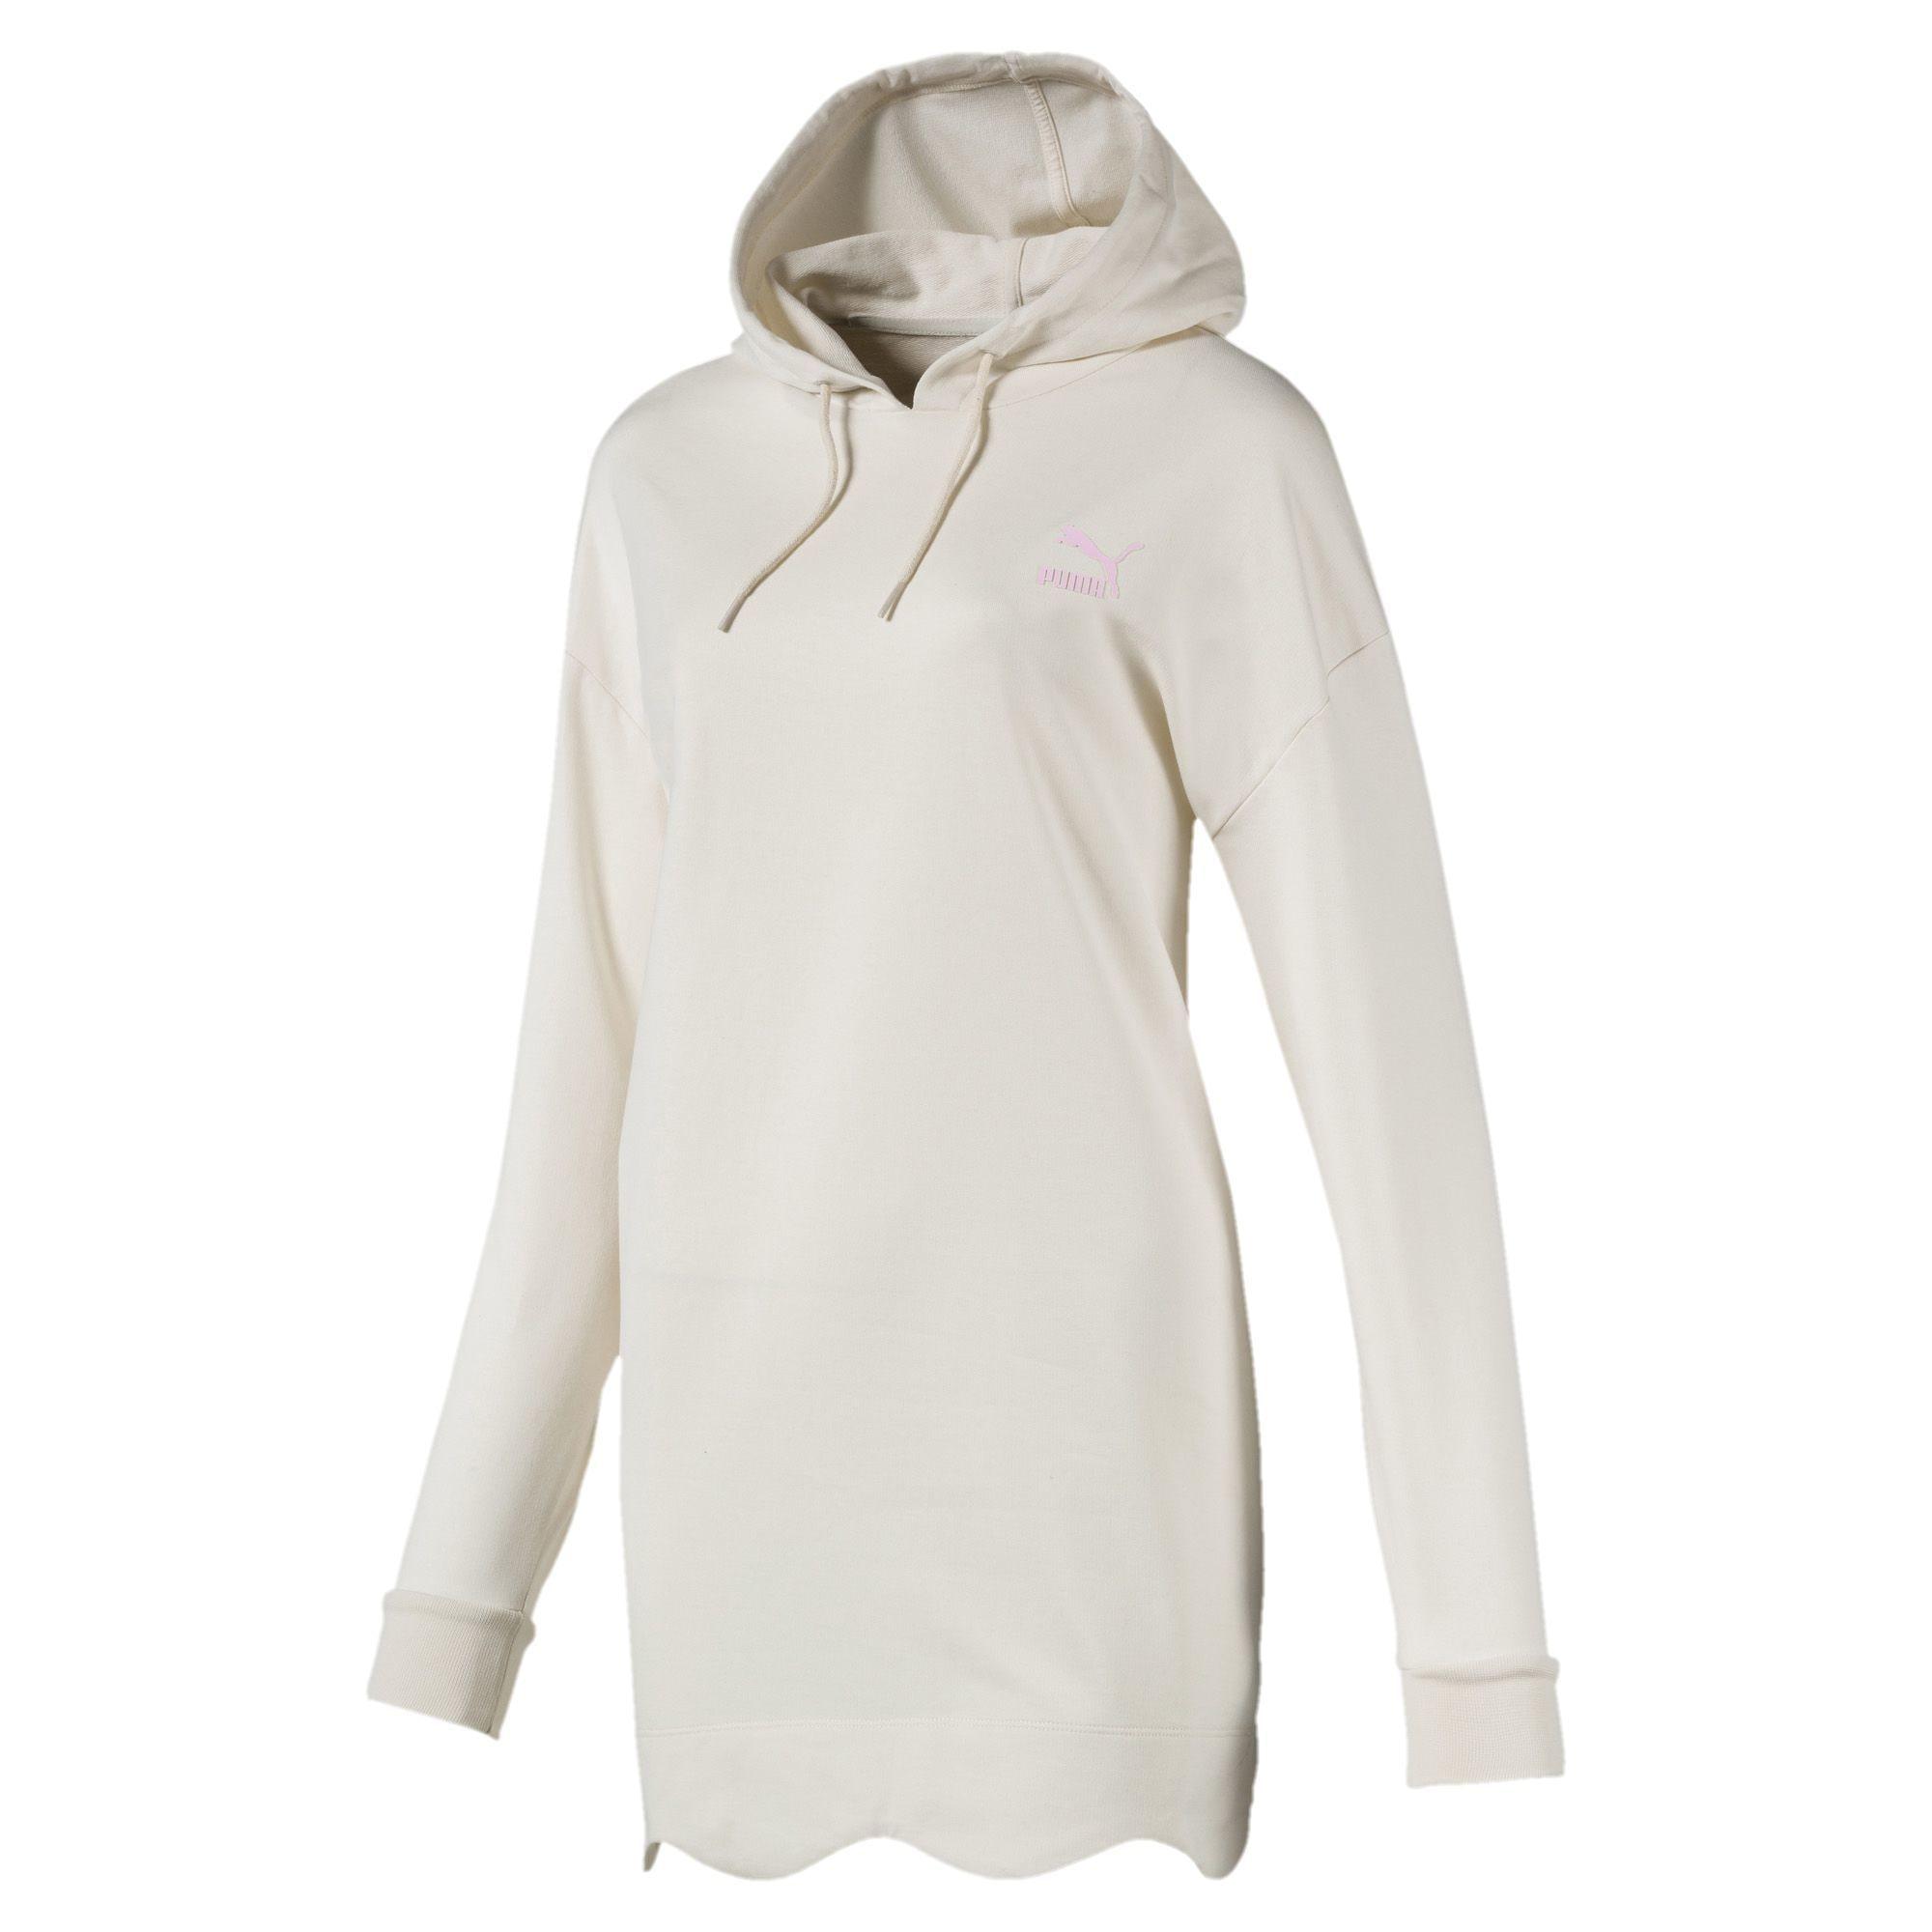 PUMA, Dames Sweatshirt, wit